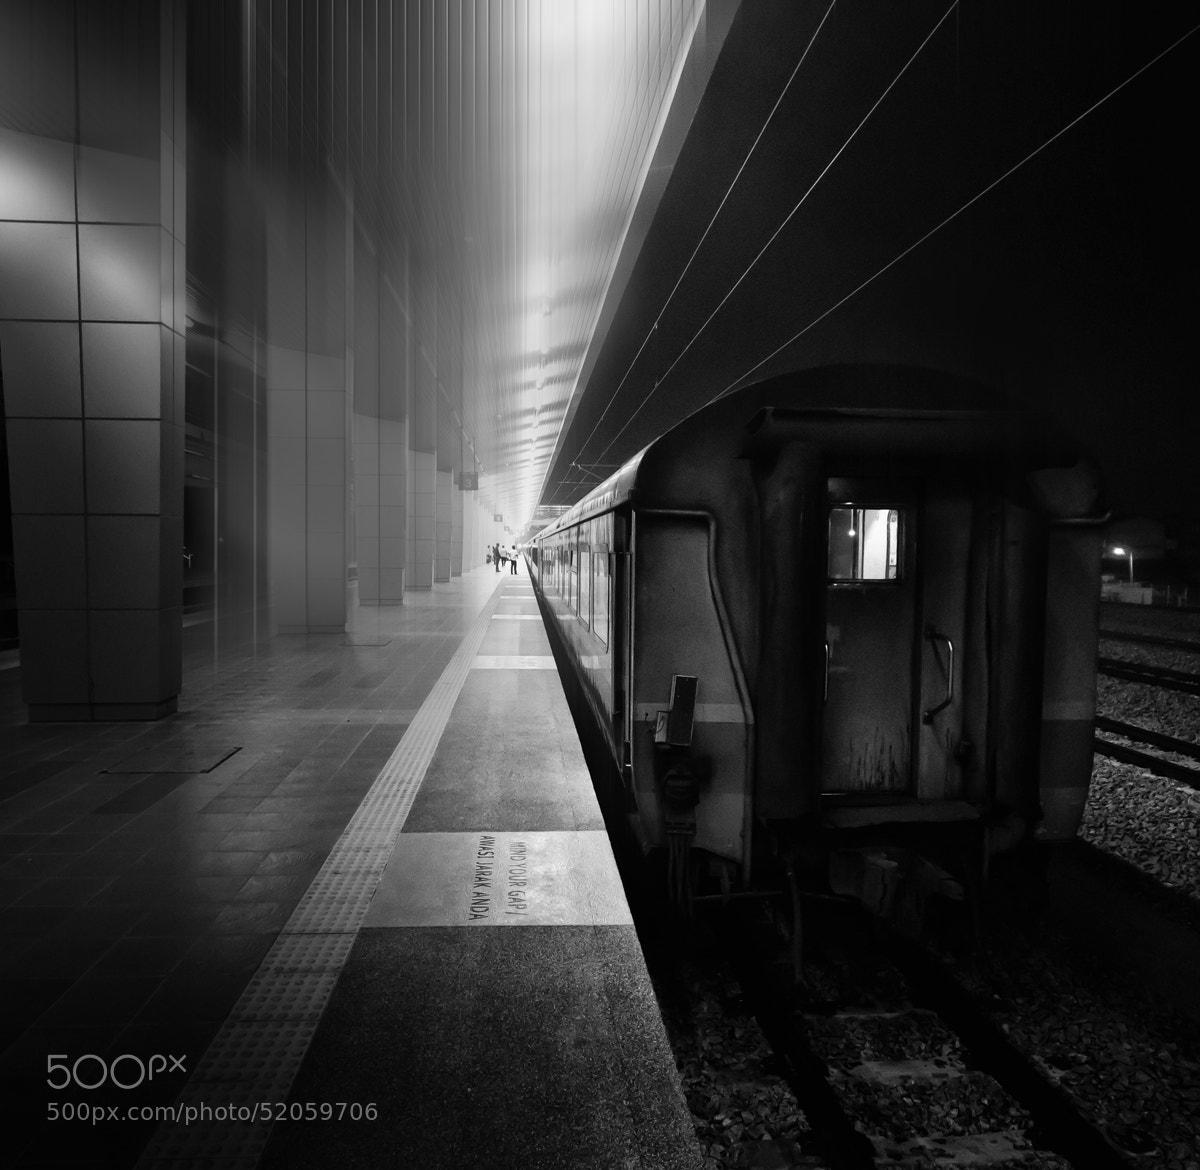 Photograph Late Night Train by Razali Ahmad on 500px